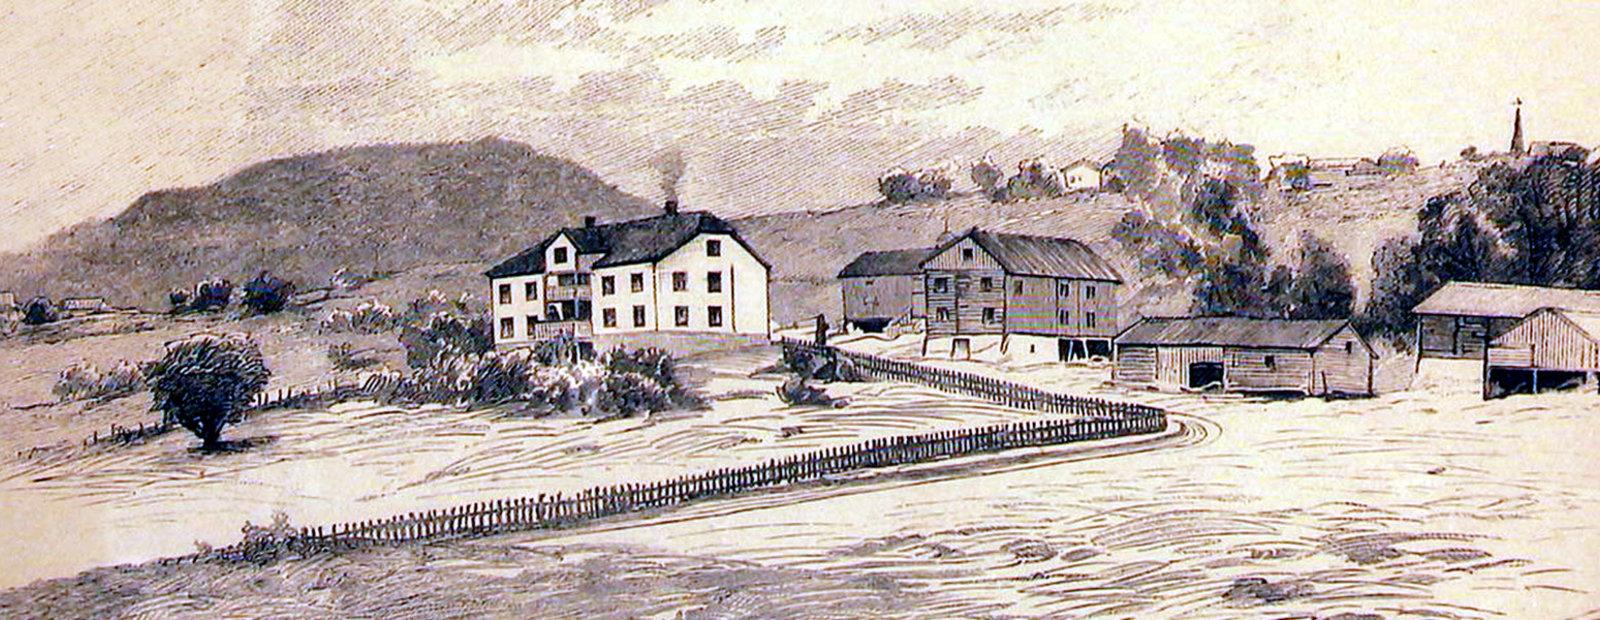 Tegning av Aulestad, ca 1890